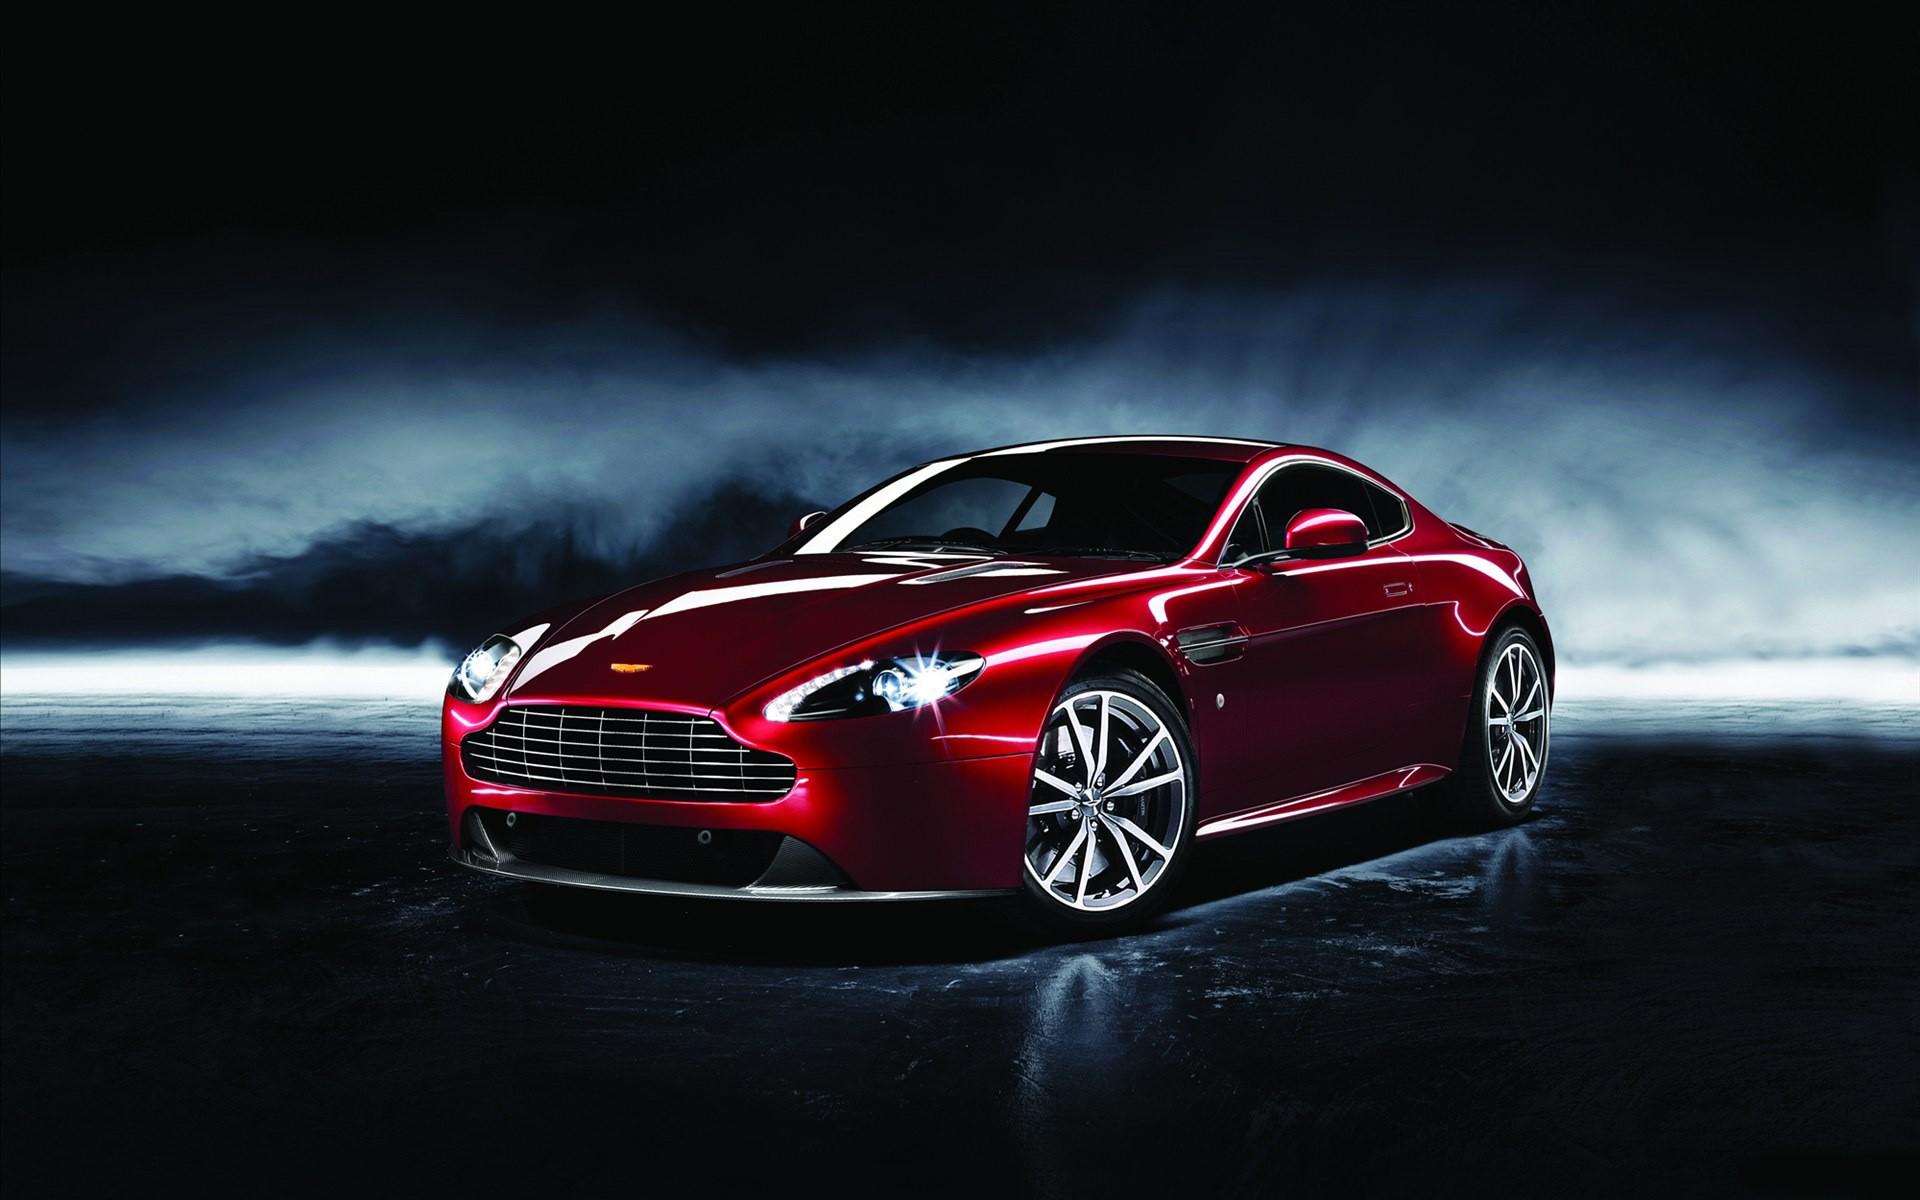 Aston Martin Dragon 88 Limited Edition Wallpaper Hd Car